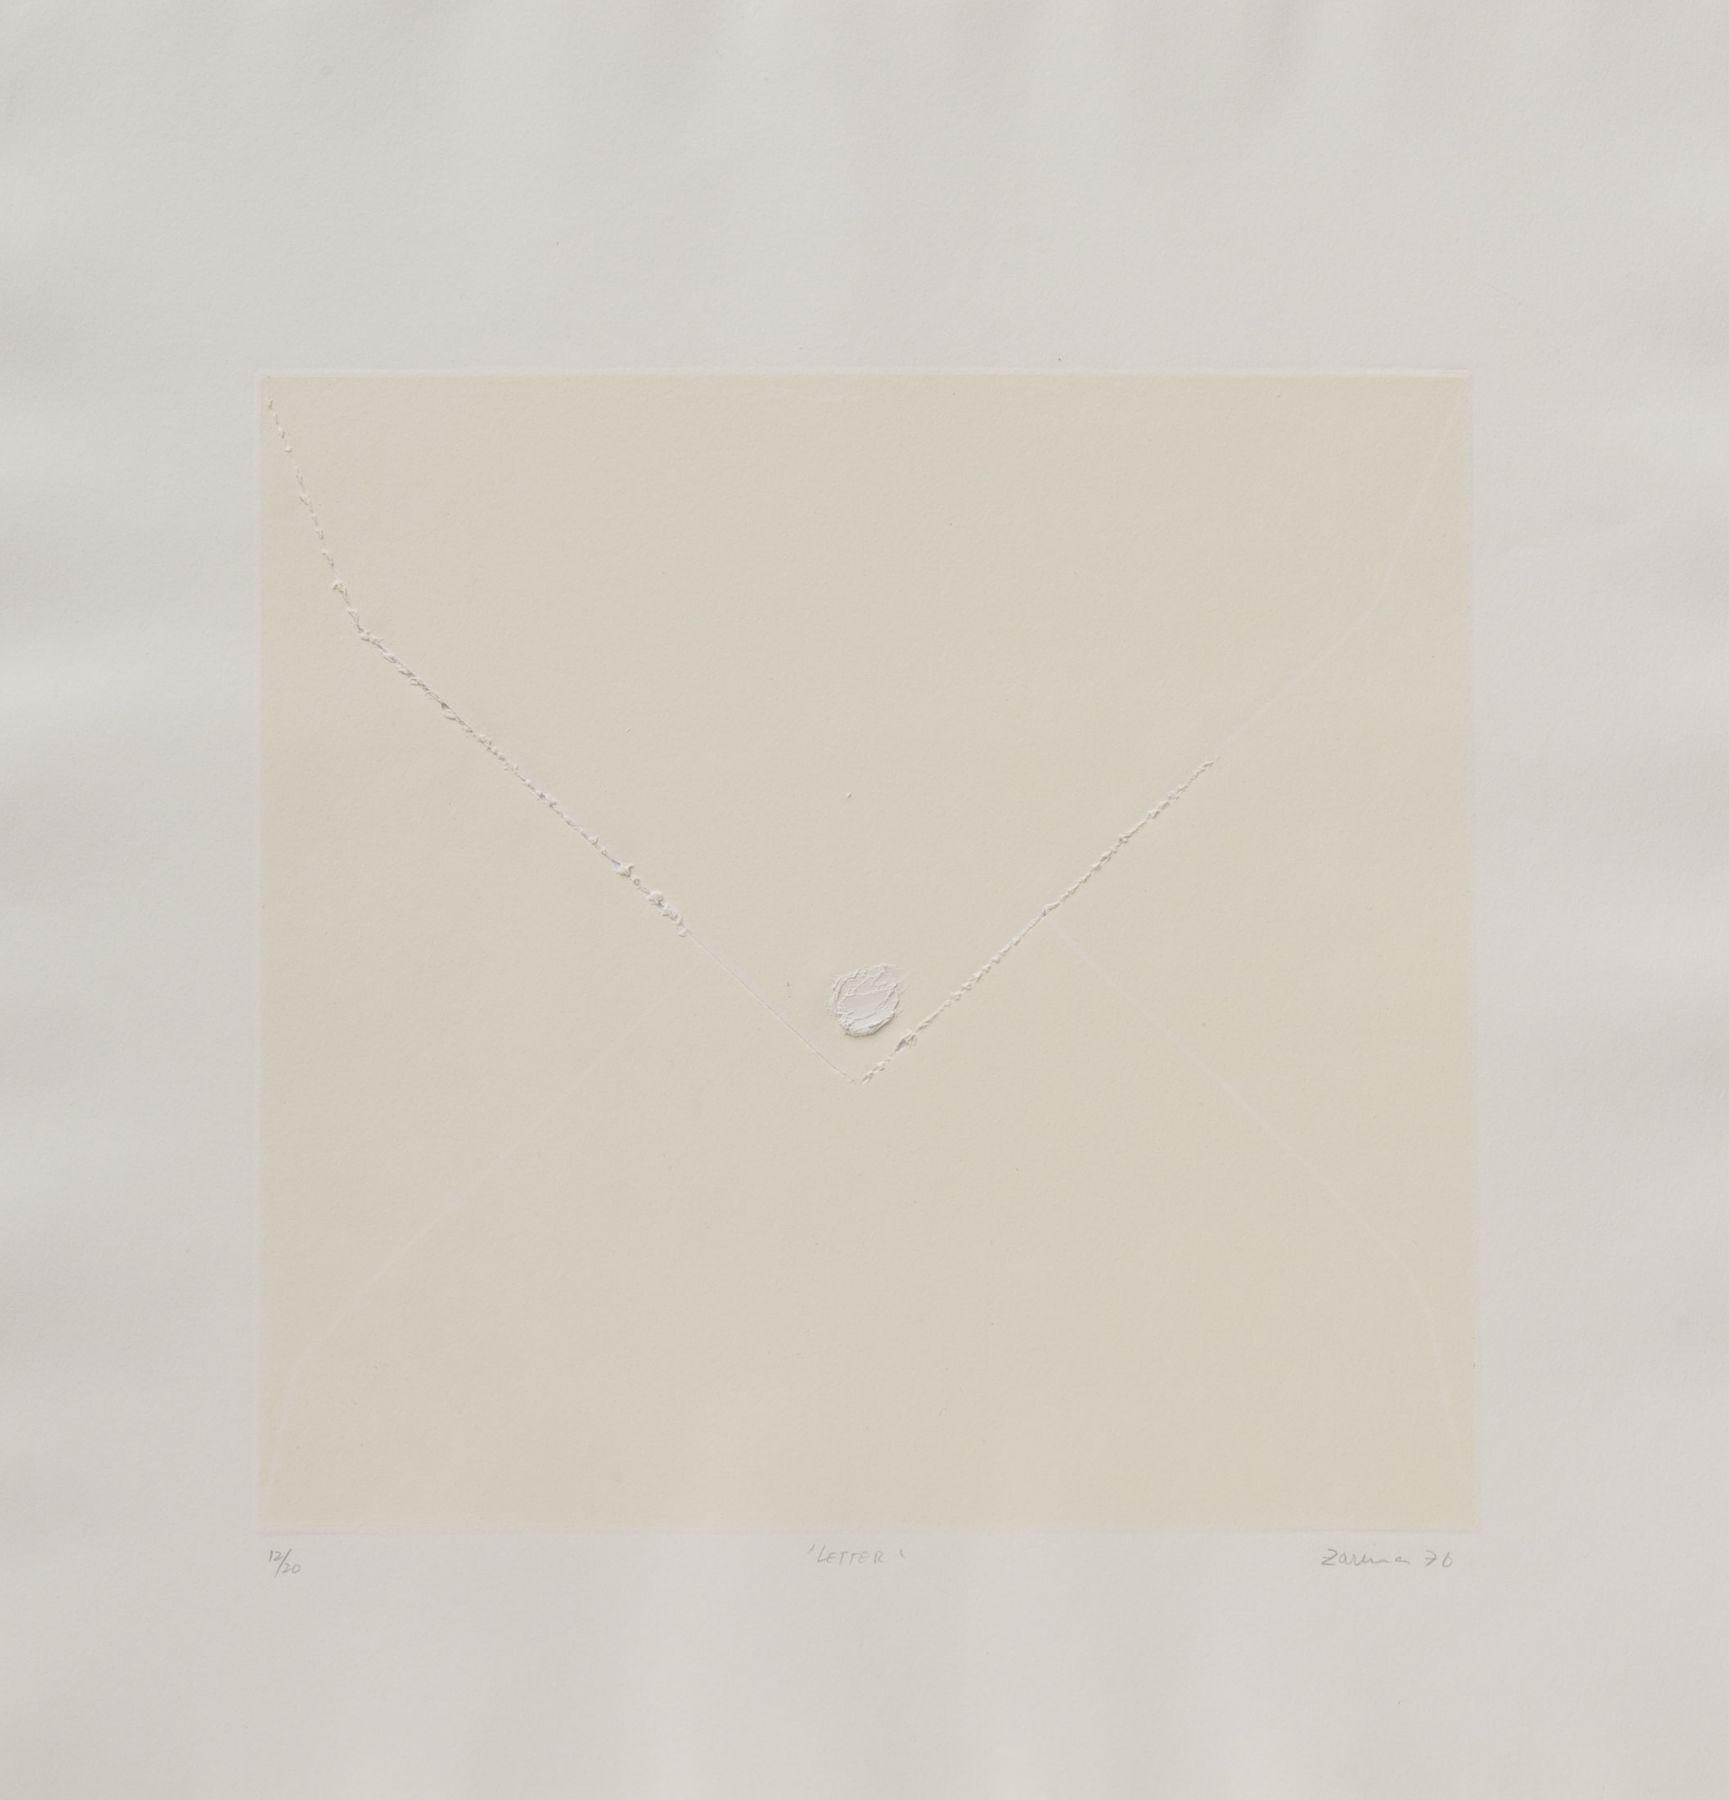 Zarina, Letter, 1976